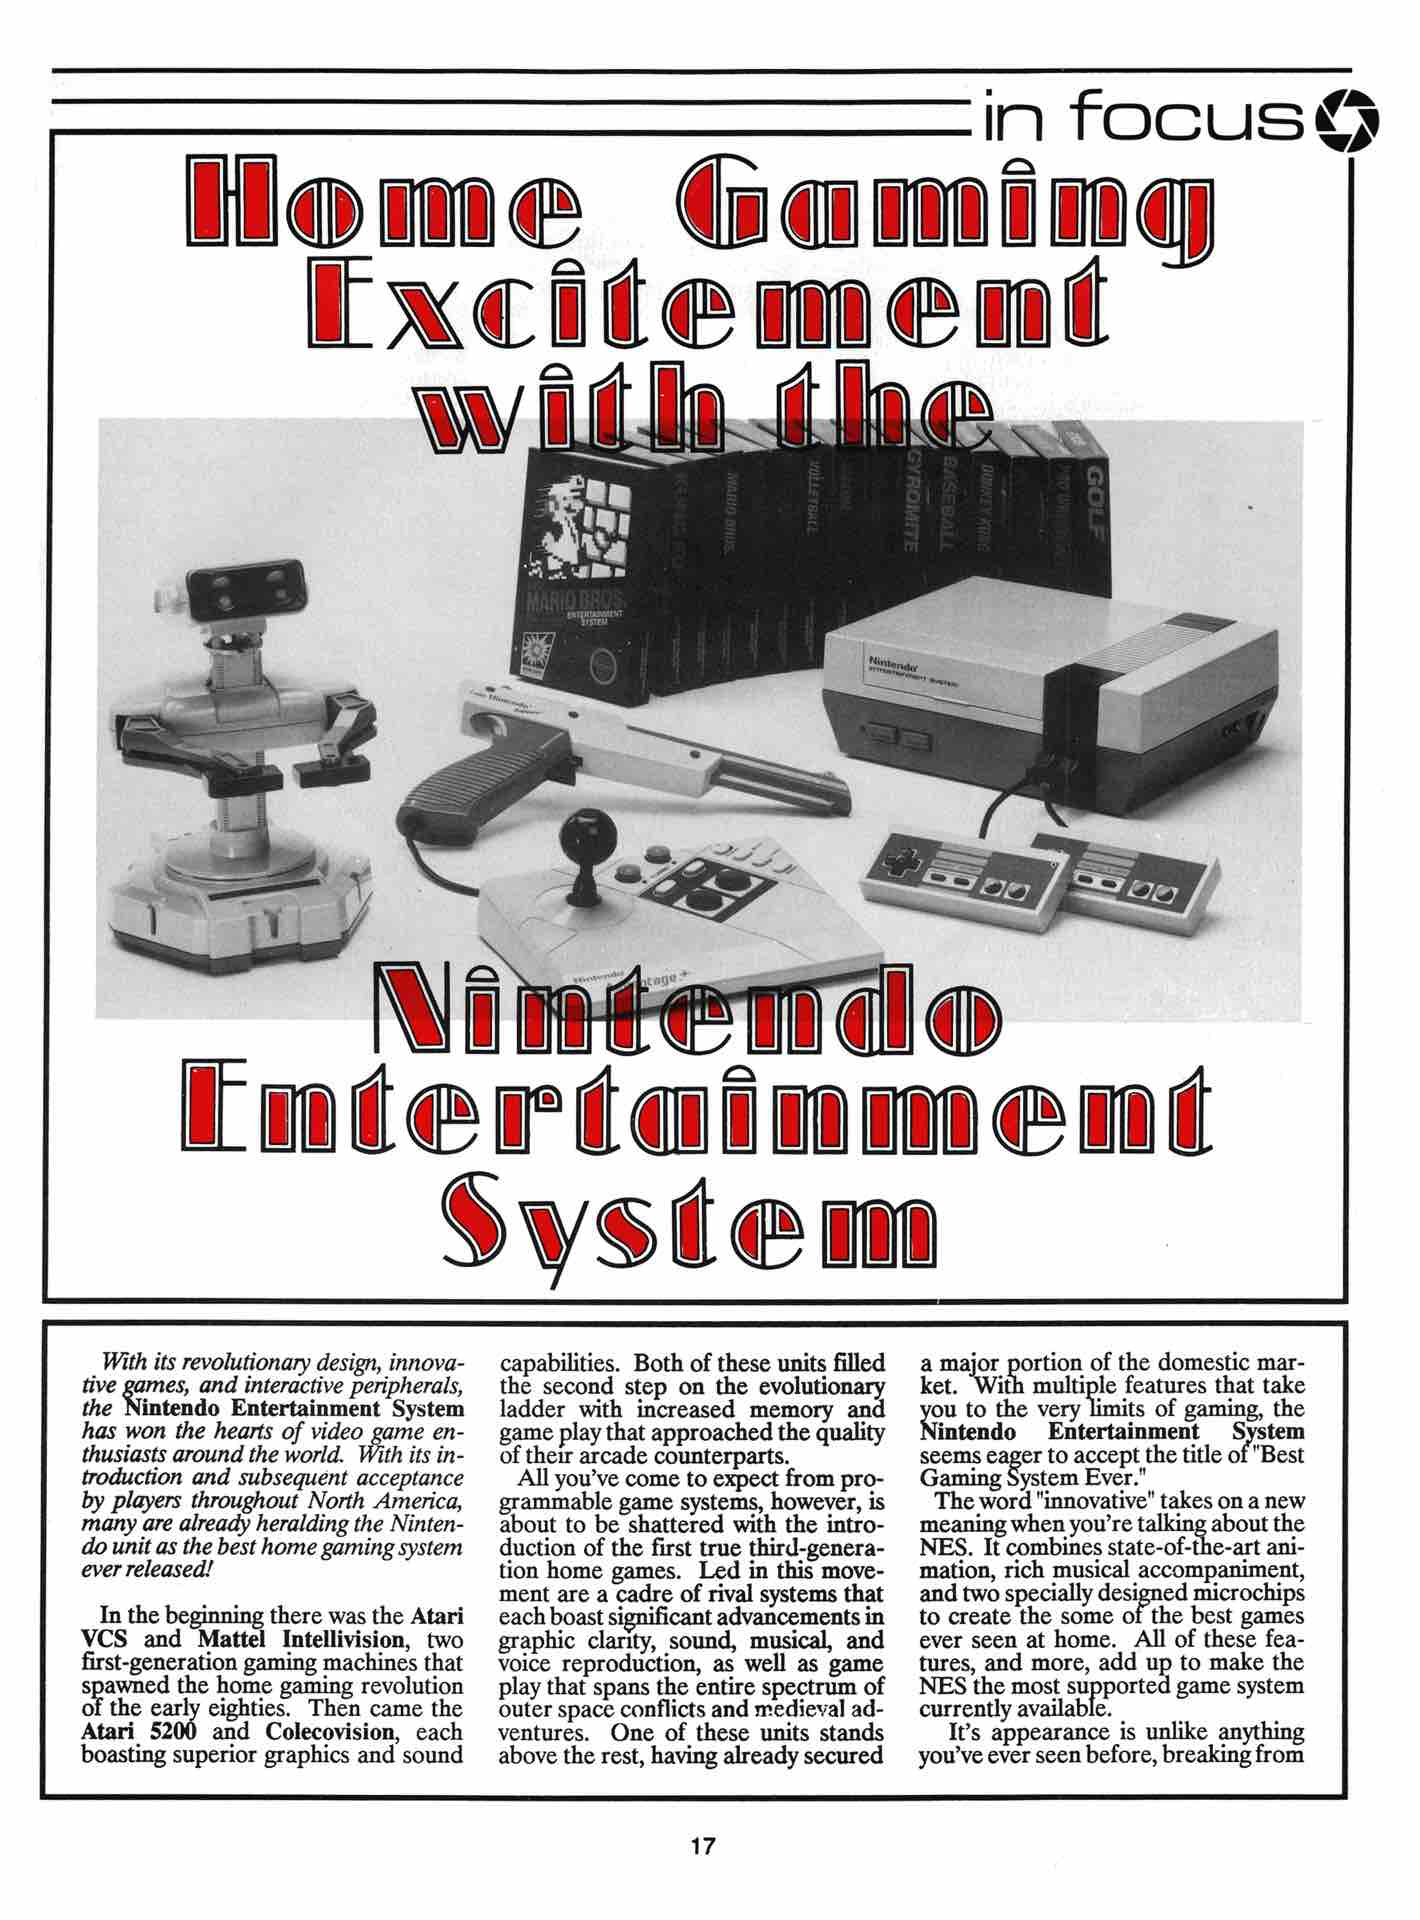 Electronic Game Player Jan:Feb 88 - pg 17